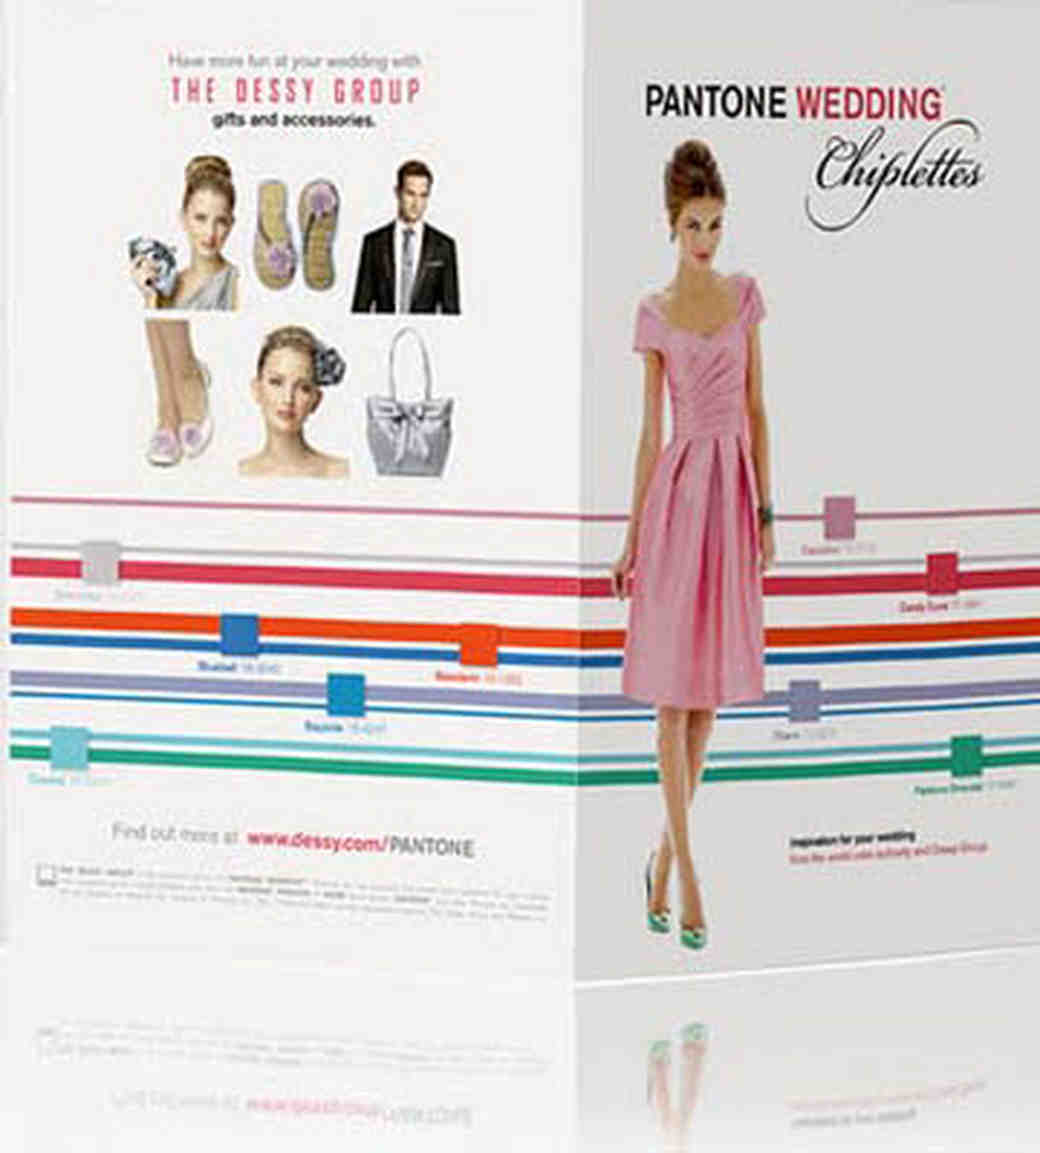 pantone-bridesmades-color-inspiration-tools-dessy-1.jpg